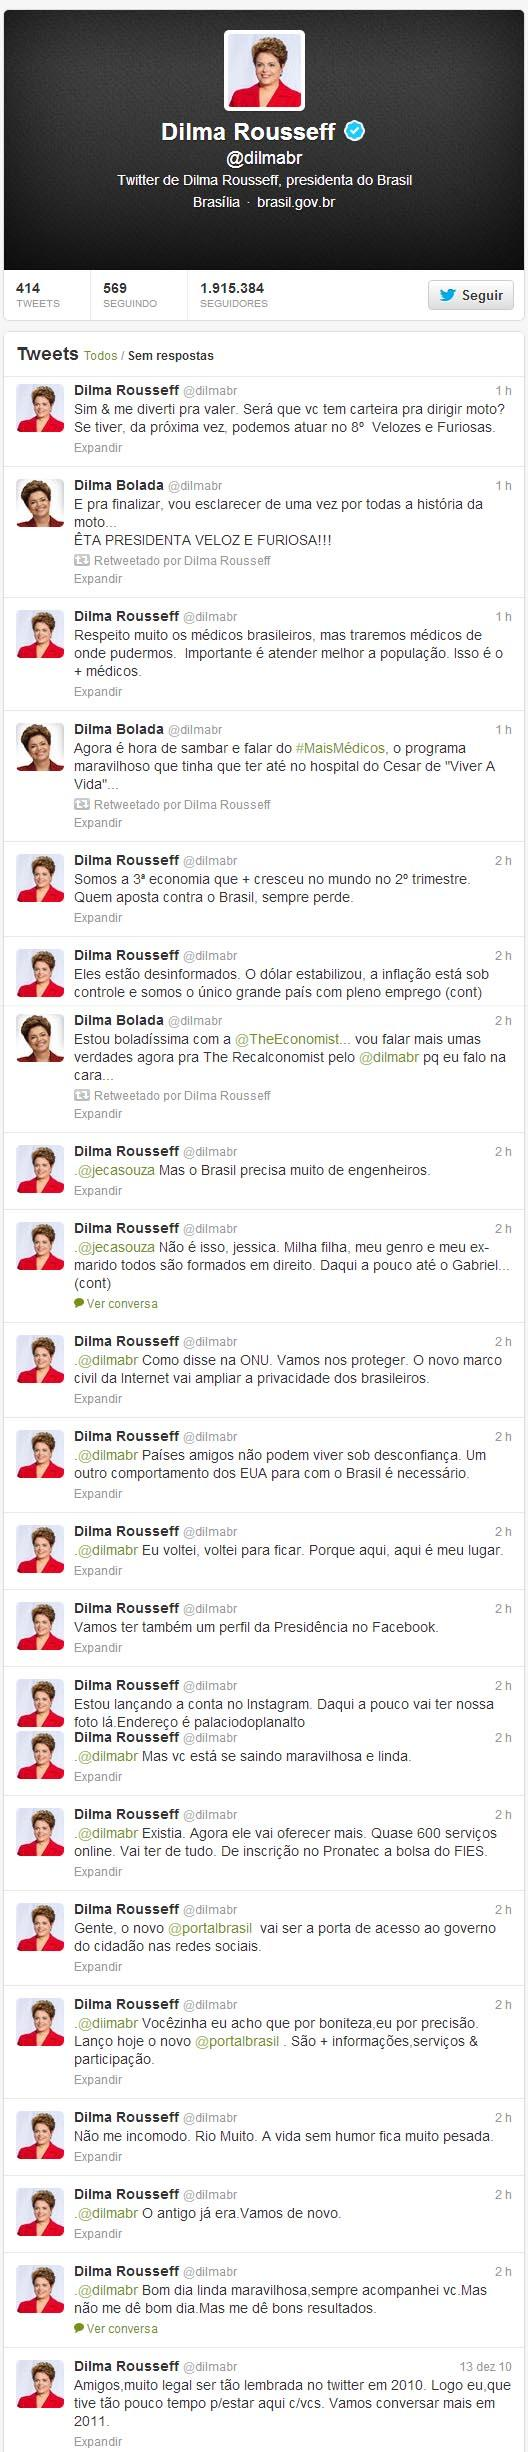 Dilma rousseff dilma bolada